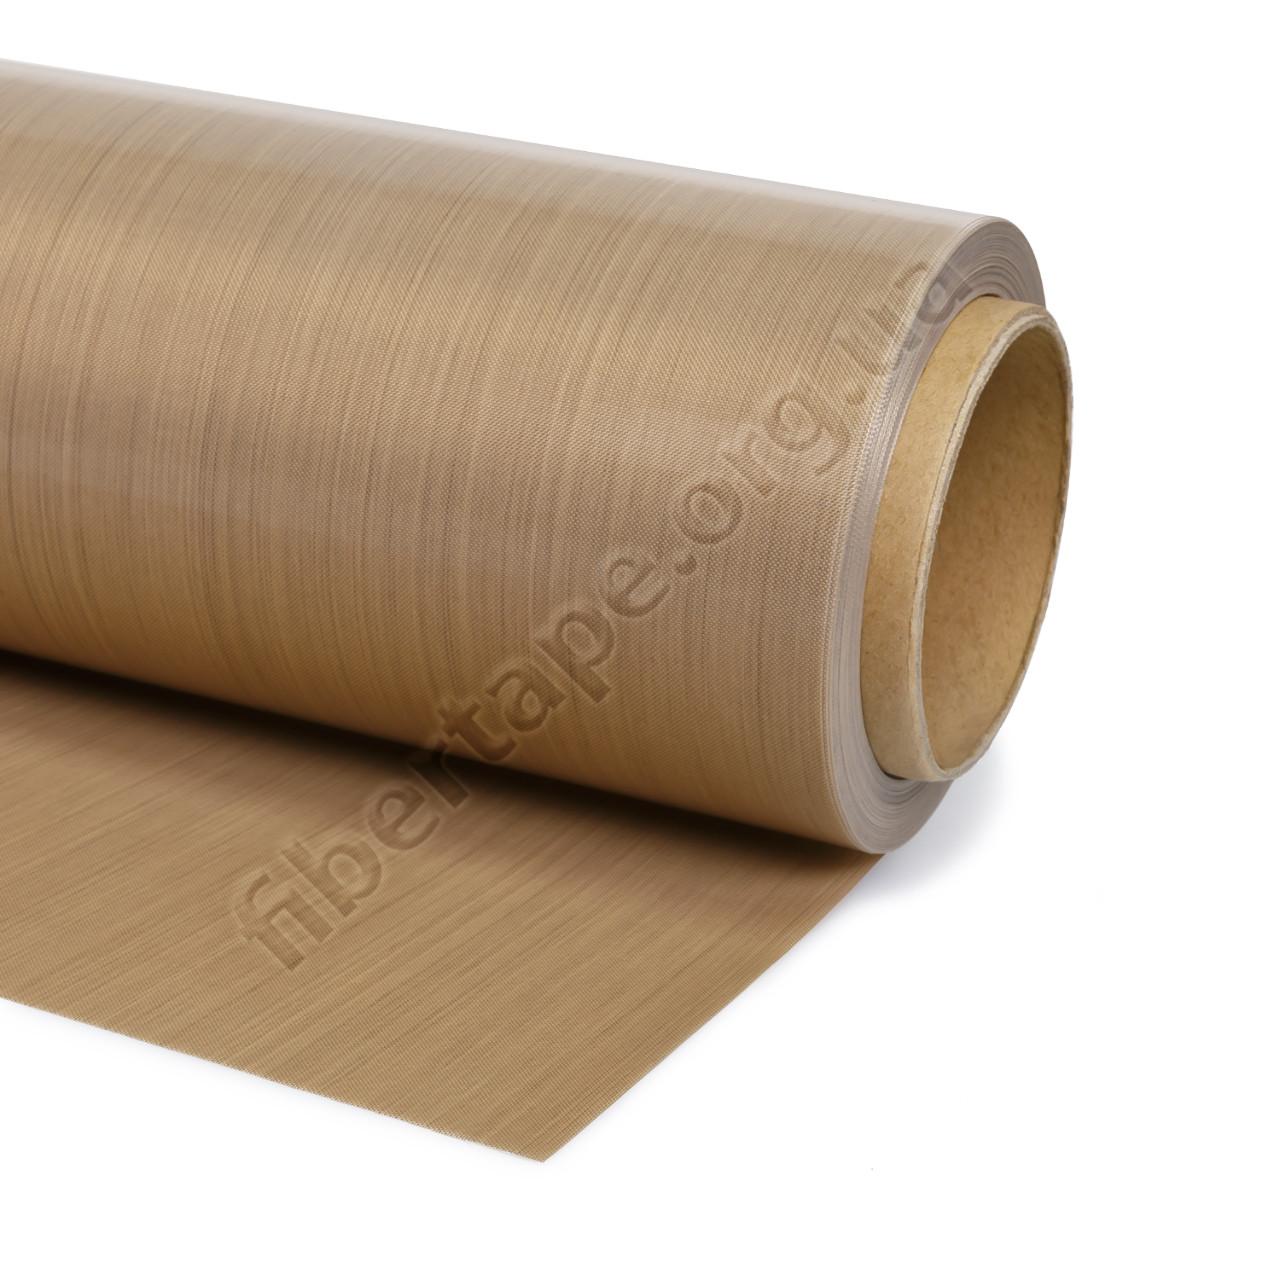 Тефлоновая лента (пленка) с порами 130 микрон